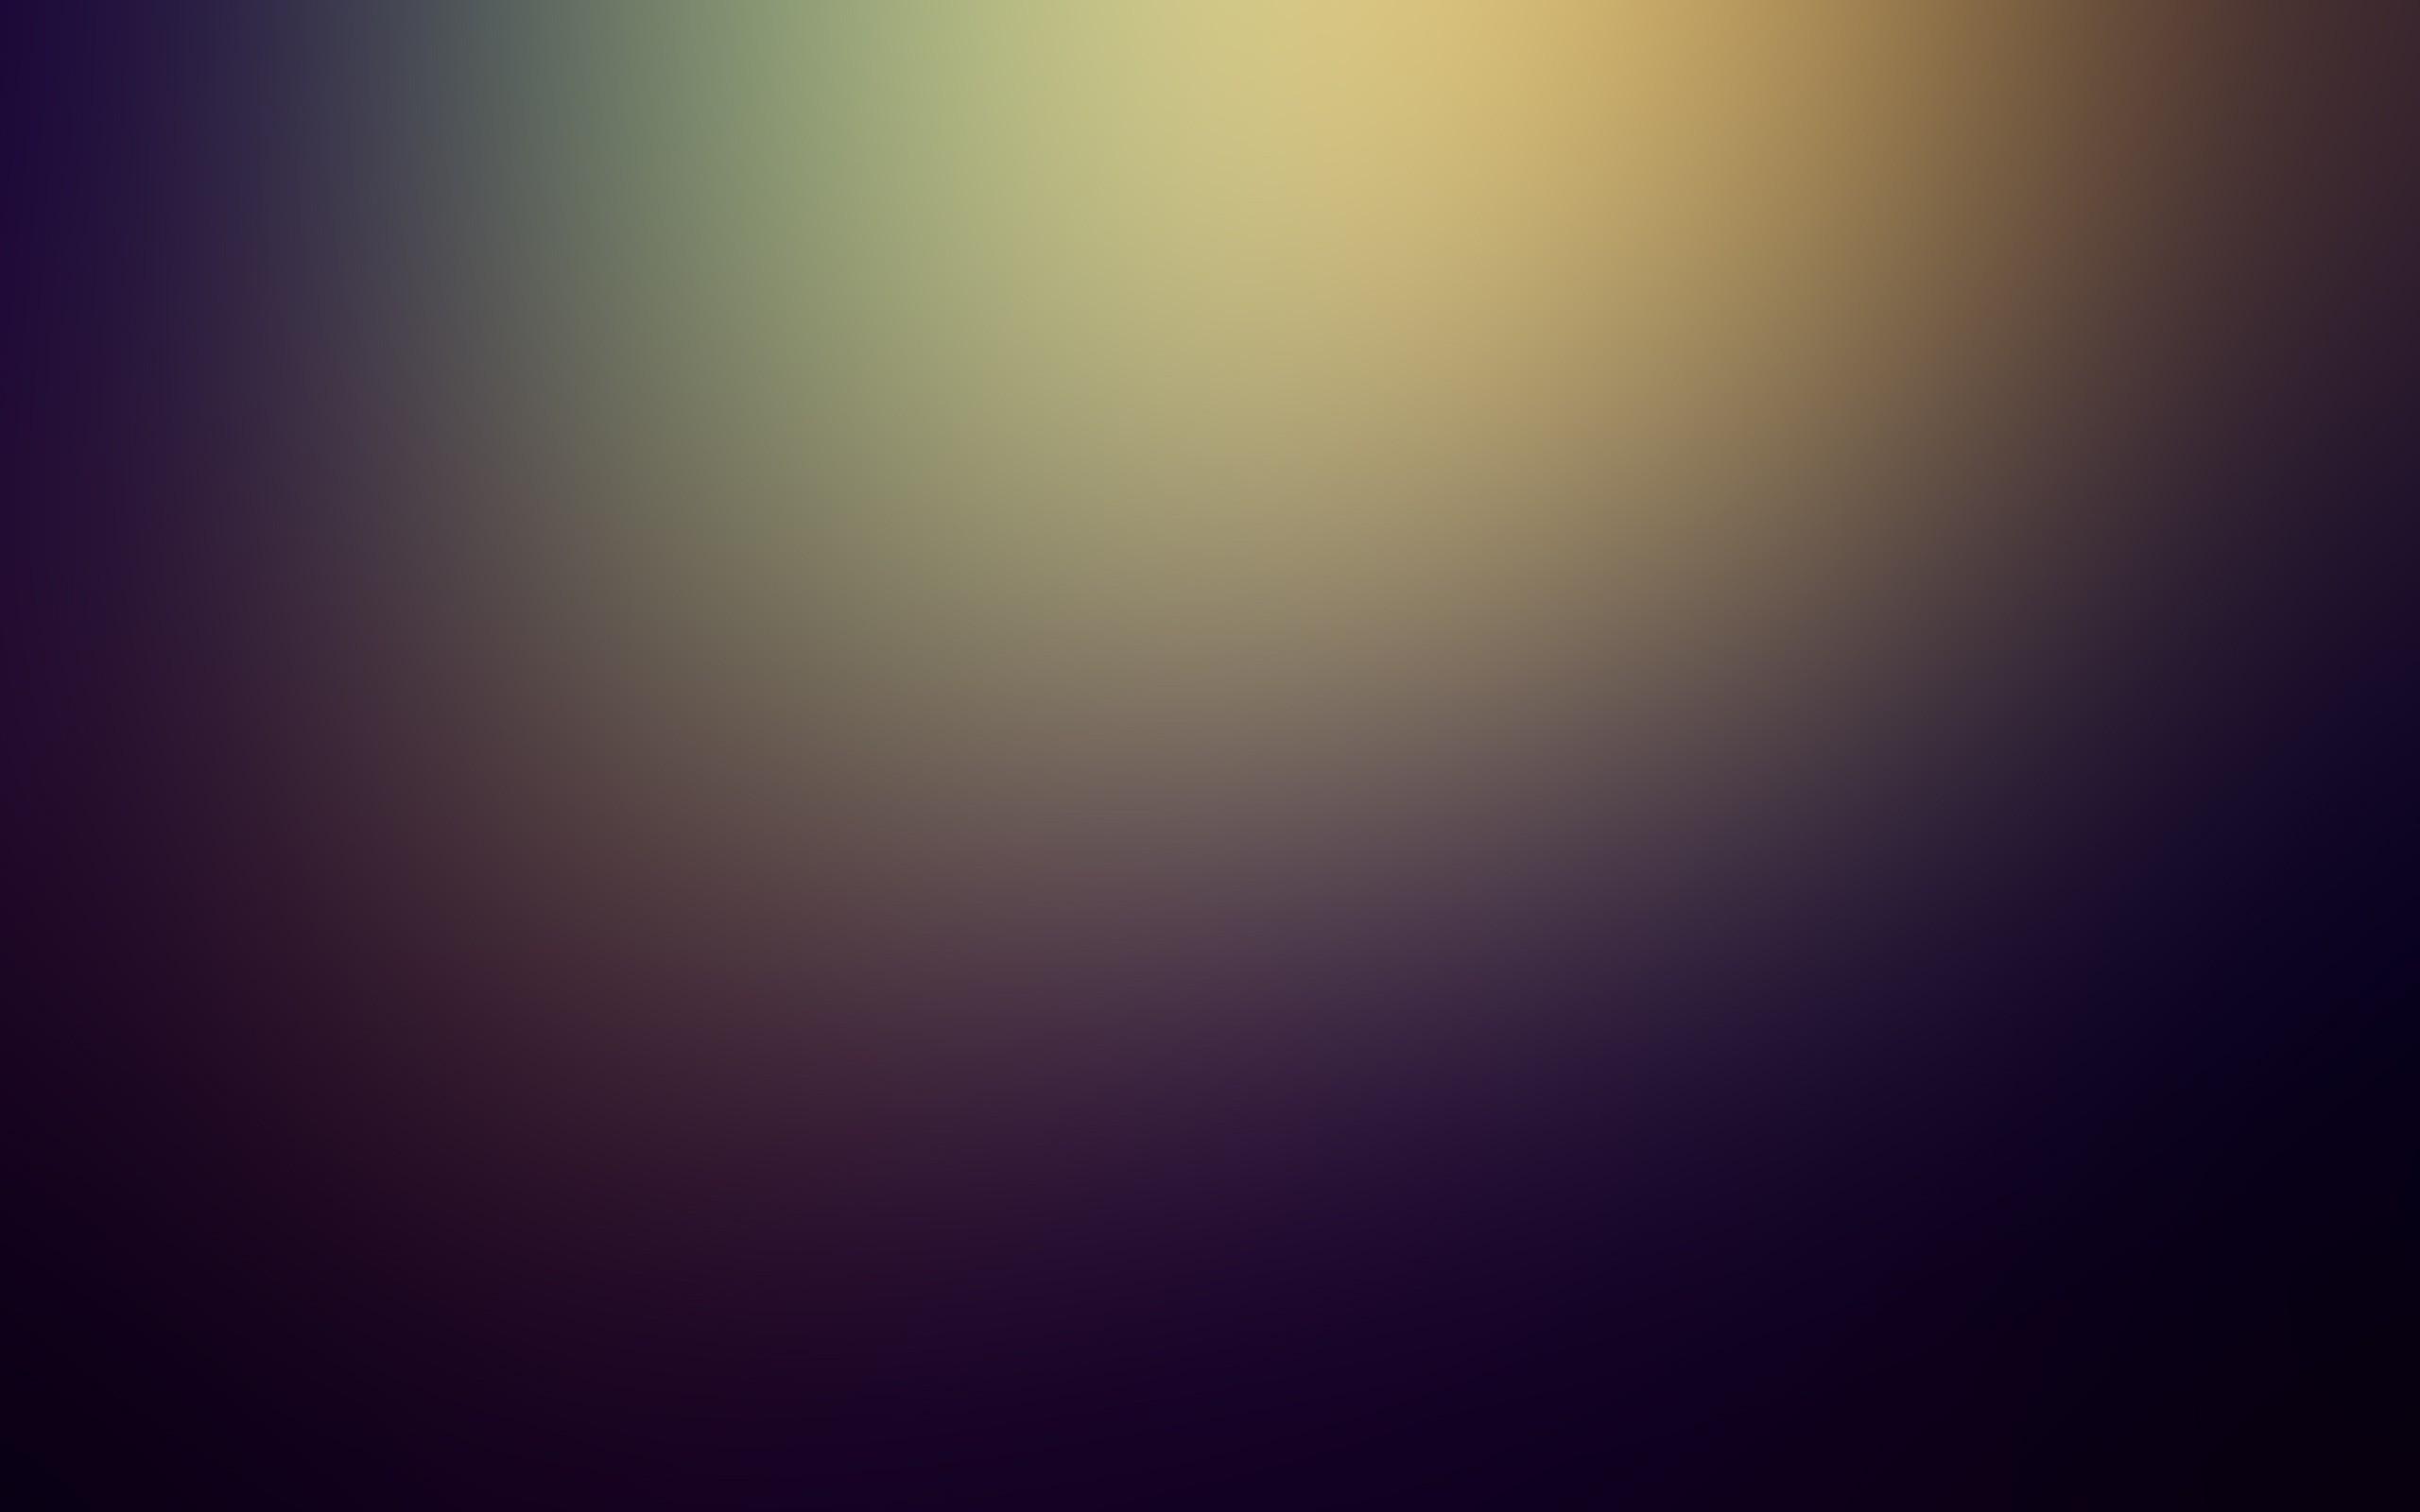 light blurred background hd - photo #22